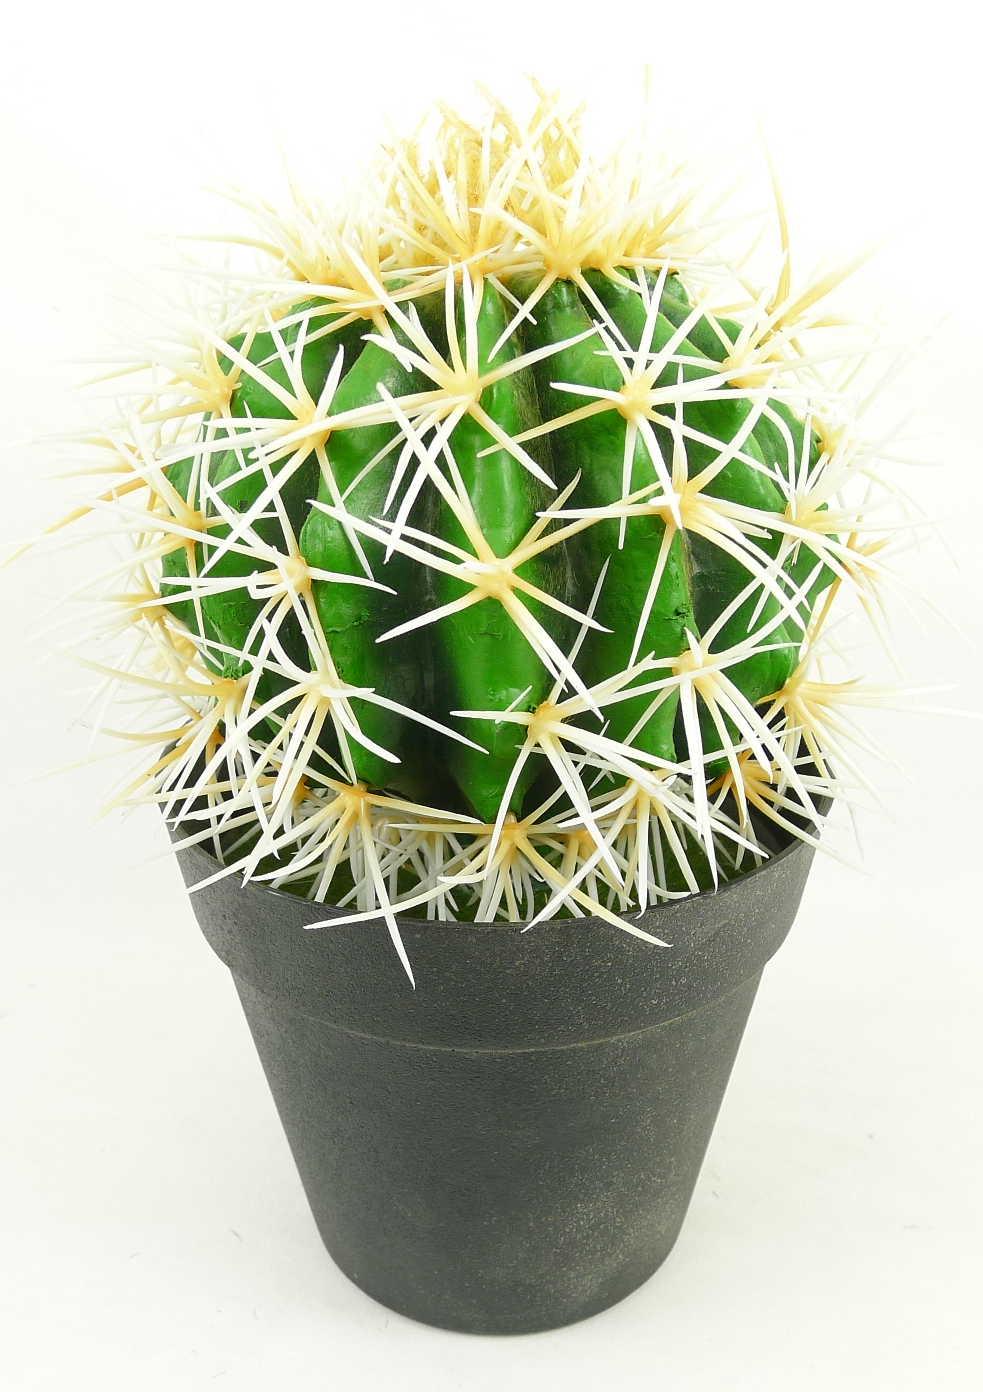 Faux cactus in black pot